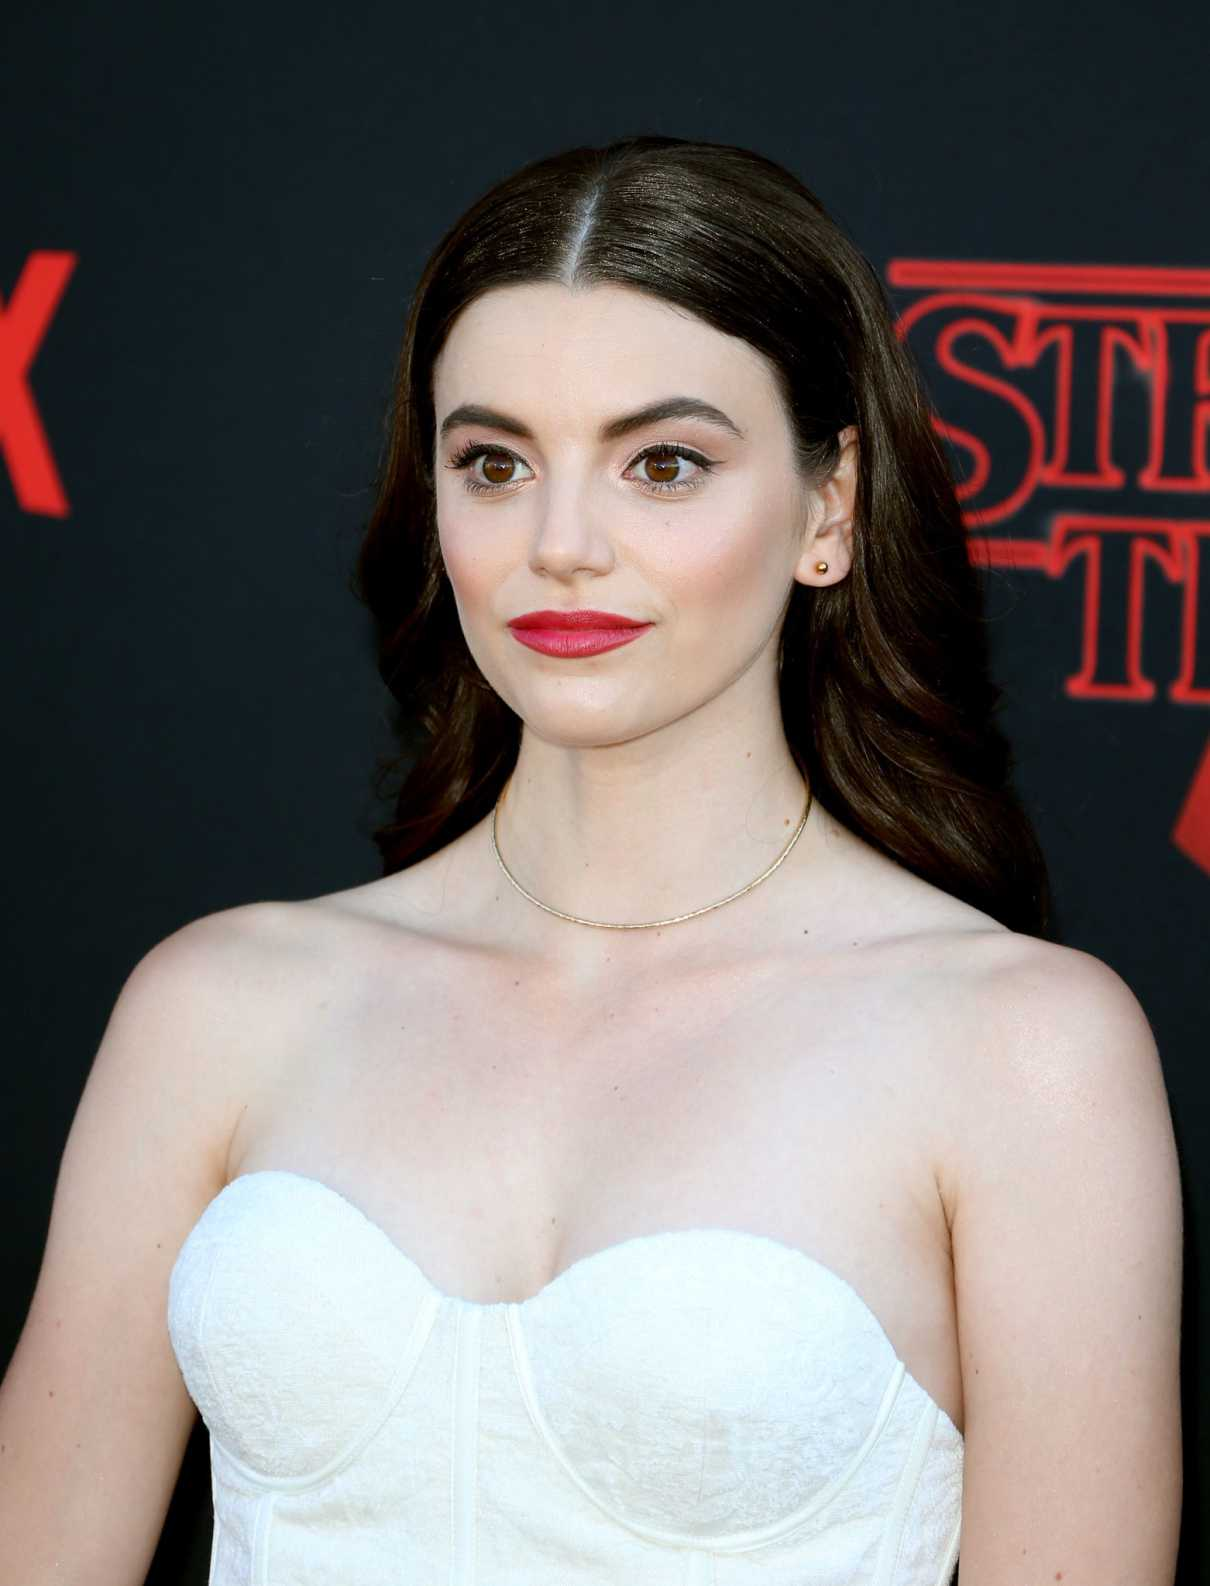 Francesca Reale attends Netflixs Stranger Things Season